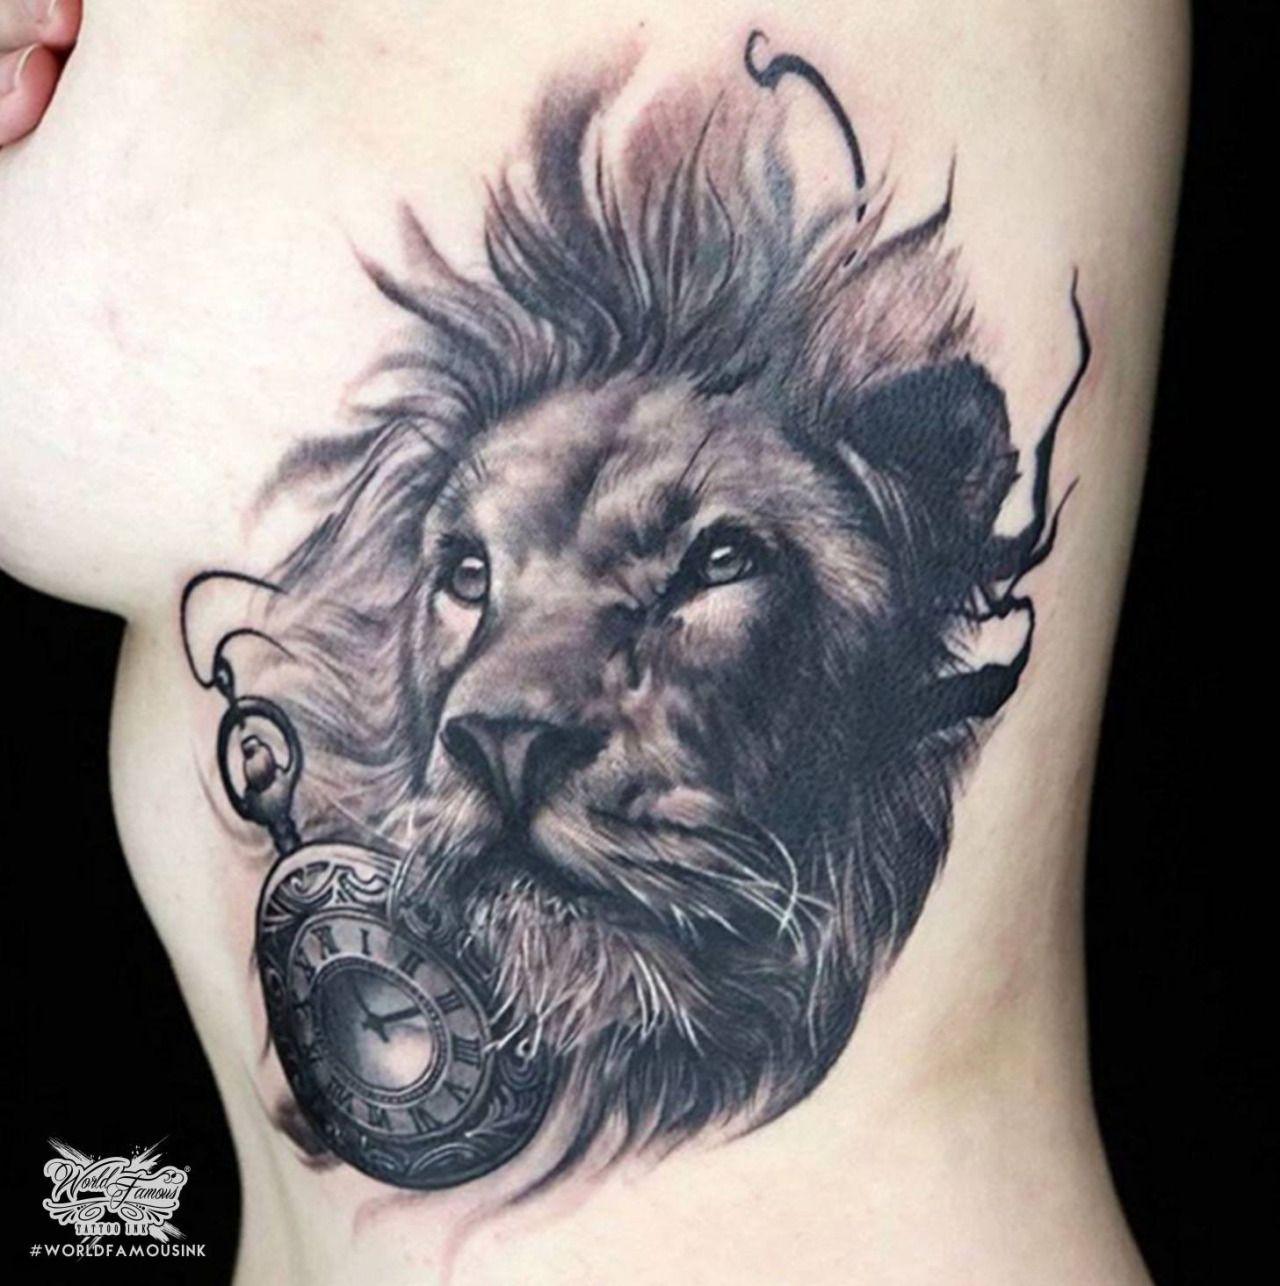 Pin By Frank Roddy On Tattoo Artist Sarah Miller Sarah Miller Fashion Hot Tattoos